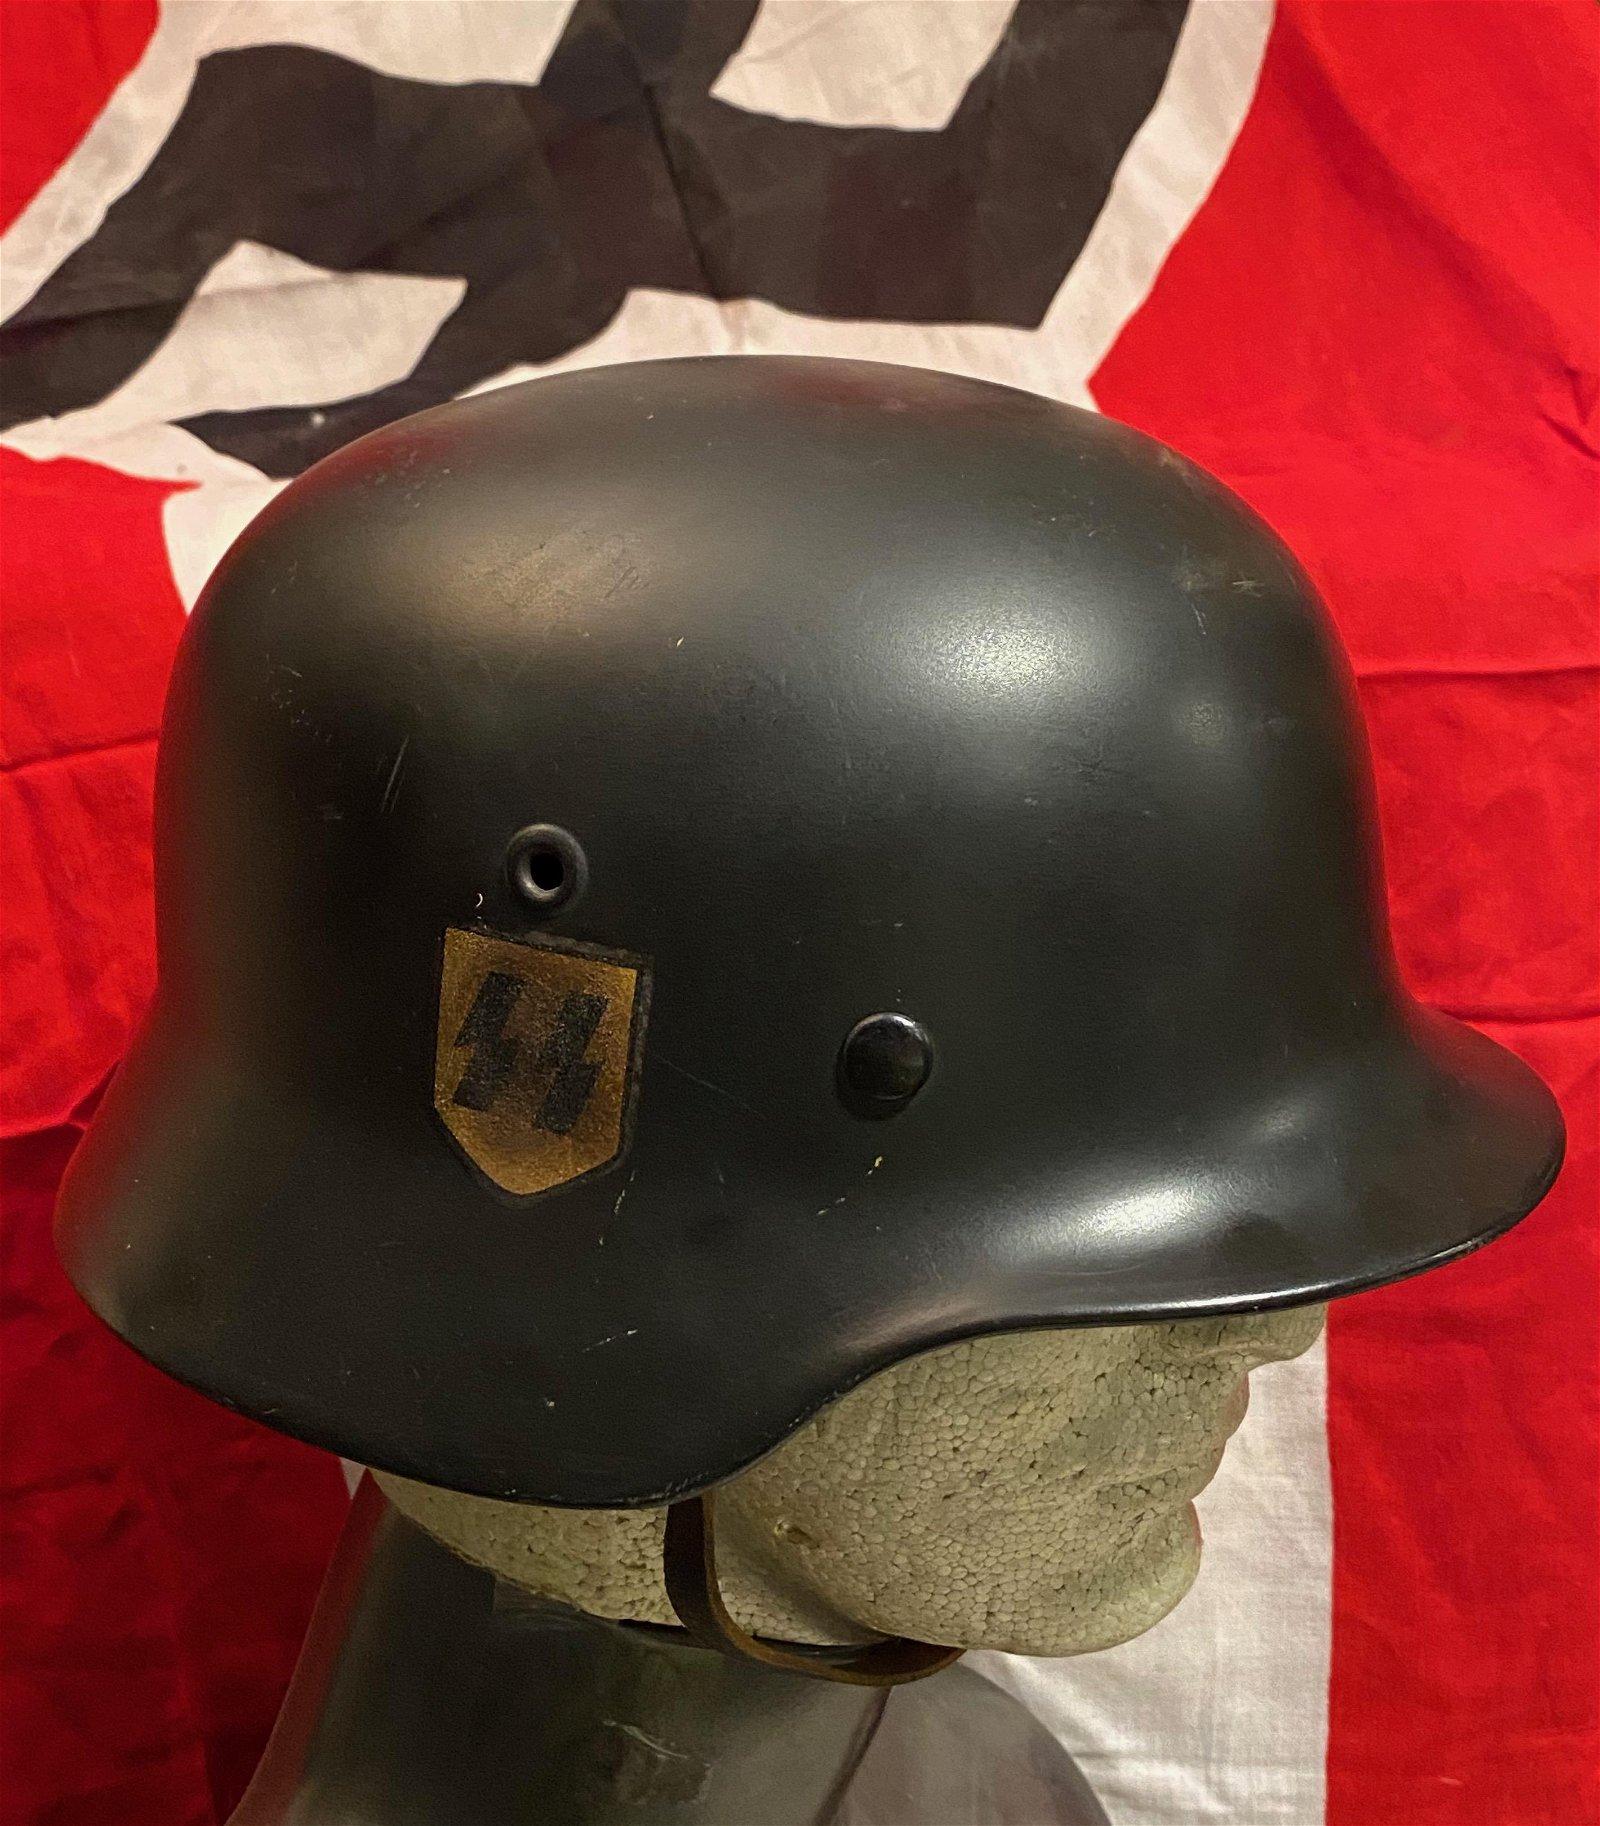 SCARCE WW2 GERMAN WAFFEN SS HELMET W/DOUBLE DECALS